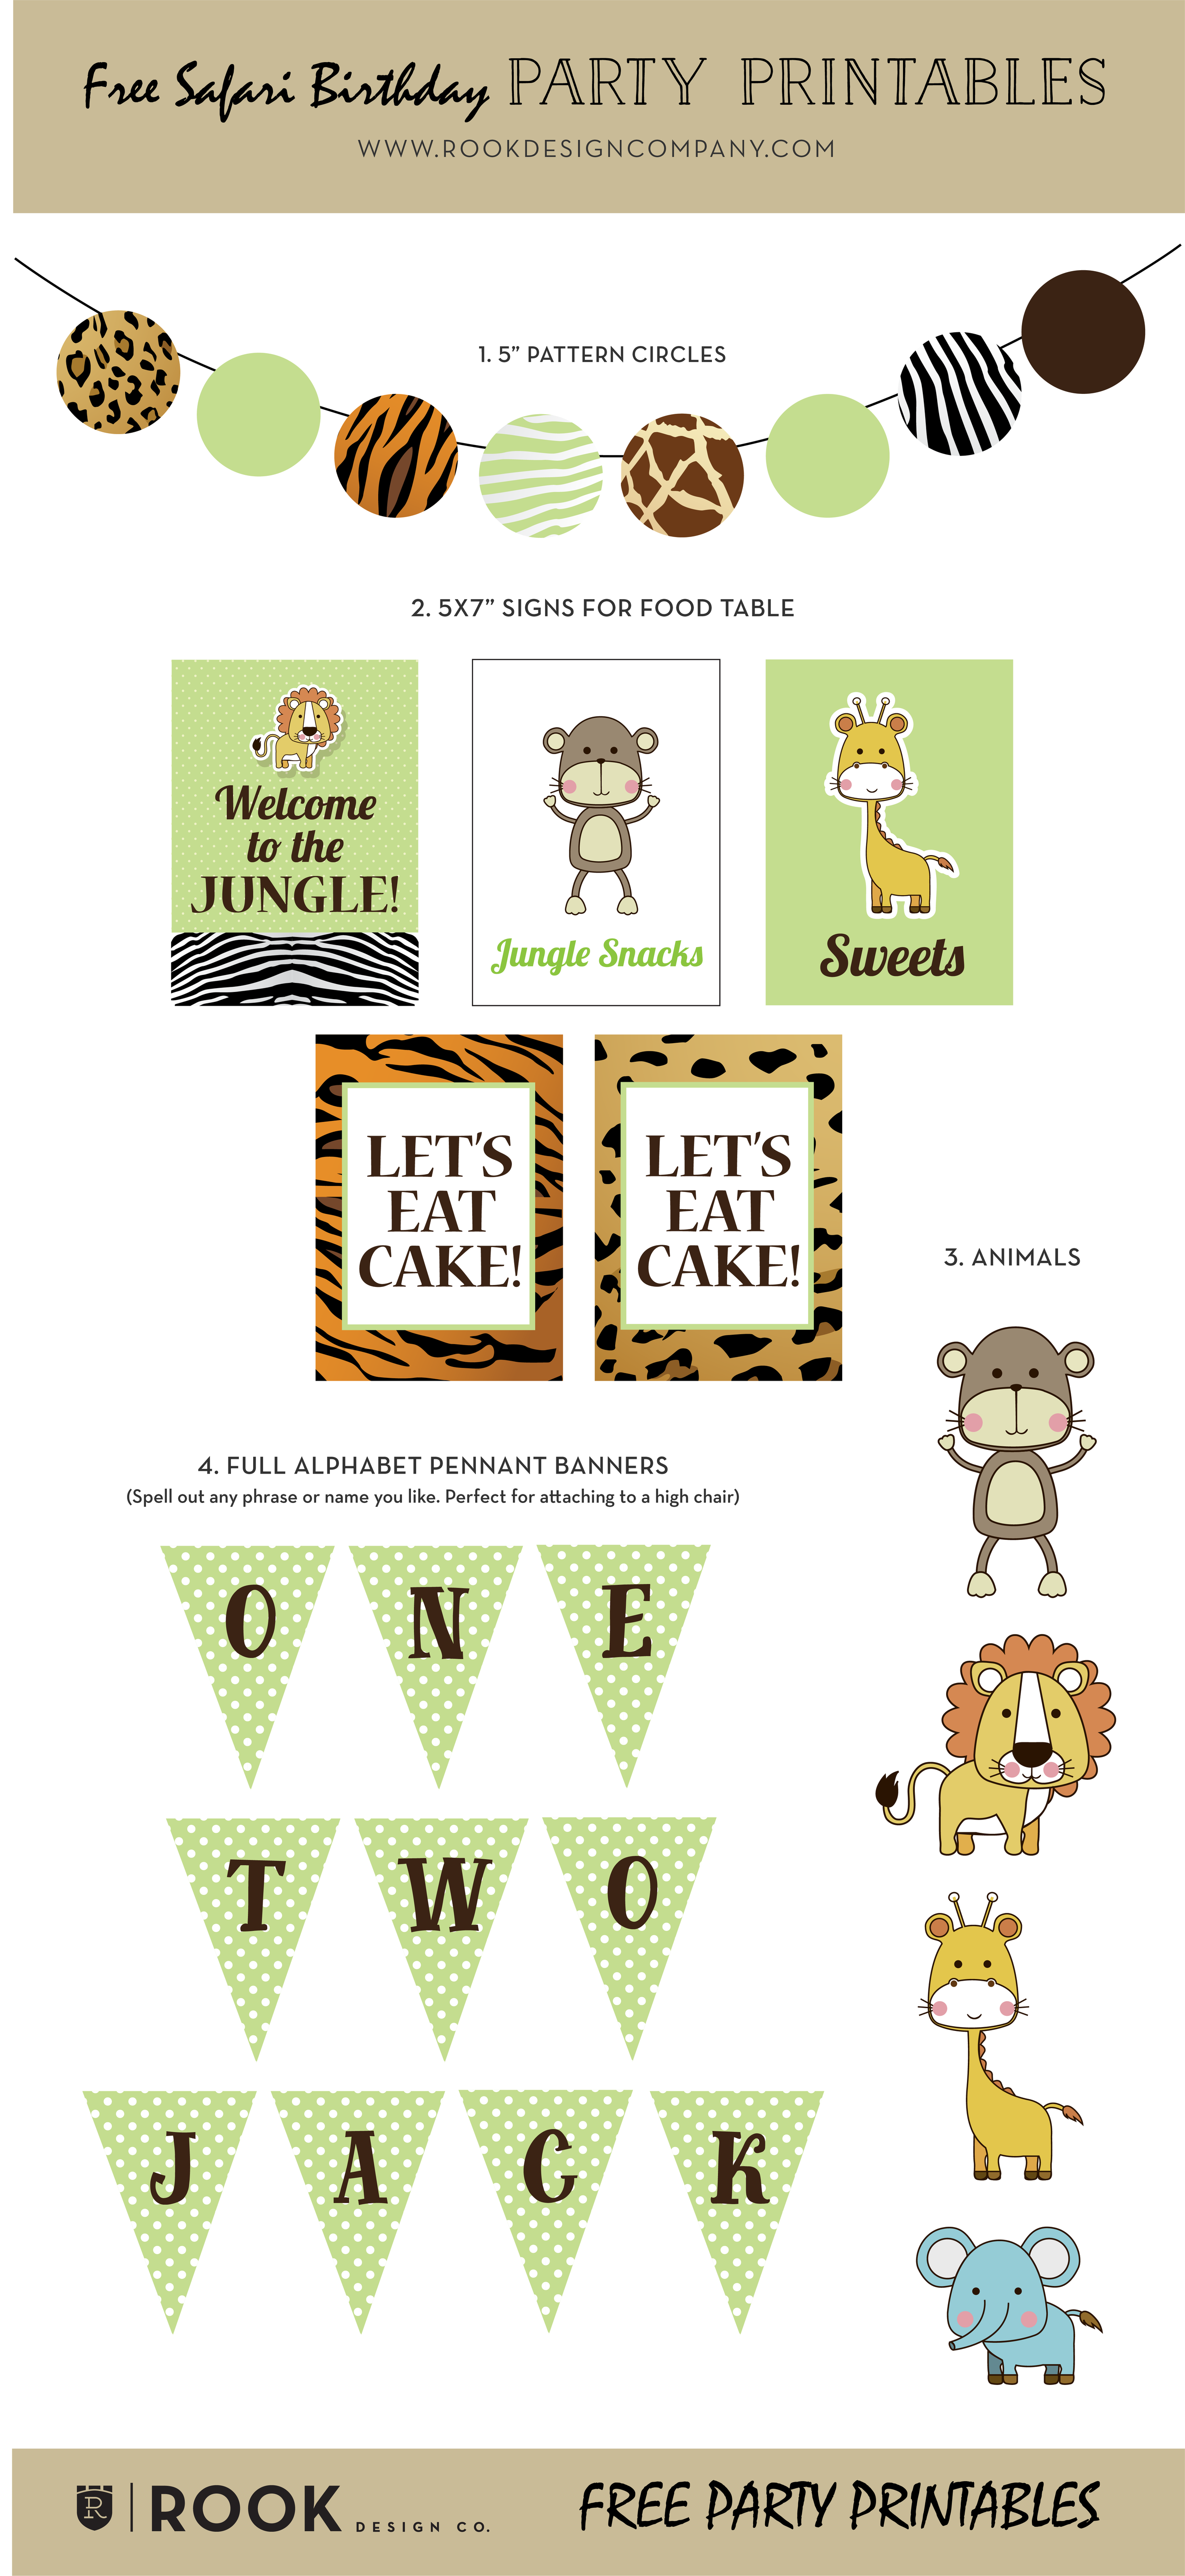 Friday Freebie Safari Theme Party Free Printables Rook Design Co Safari Theme Party Safari Birthday Safari Birthday Party Decorations